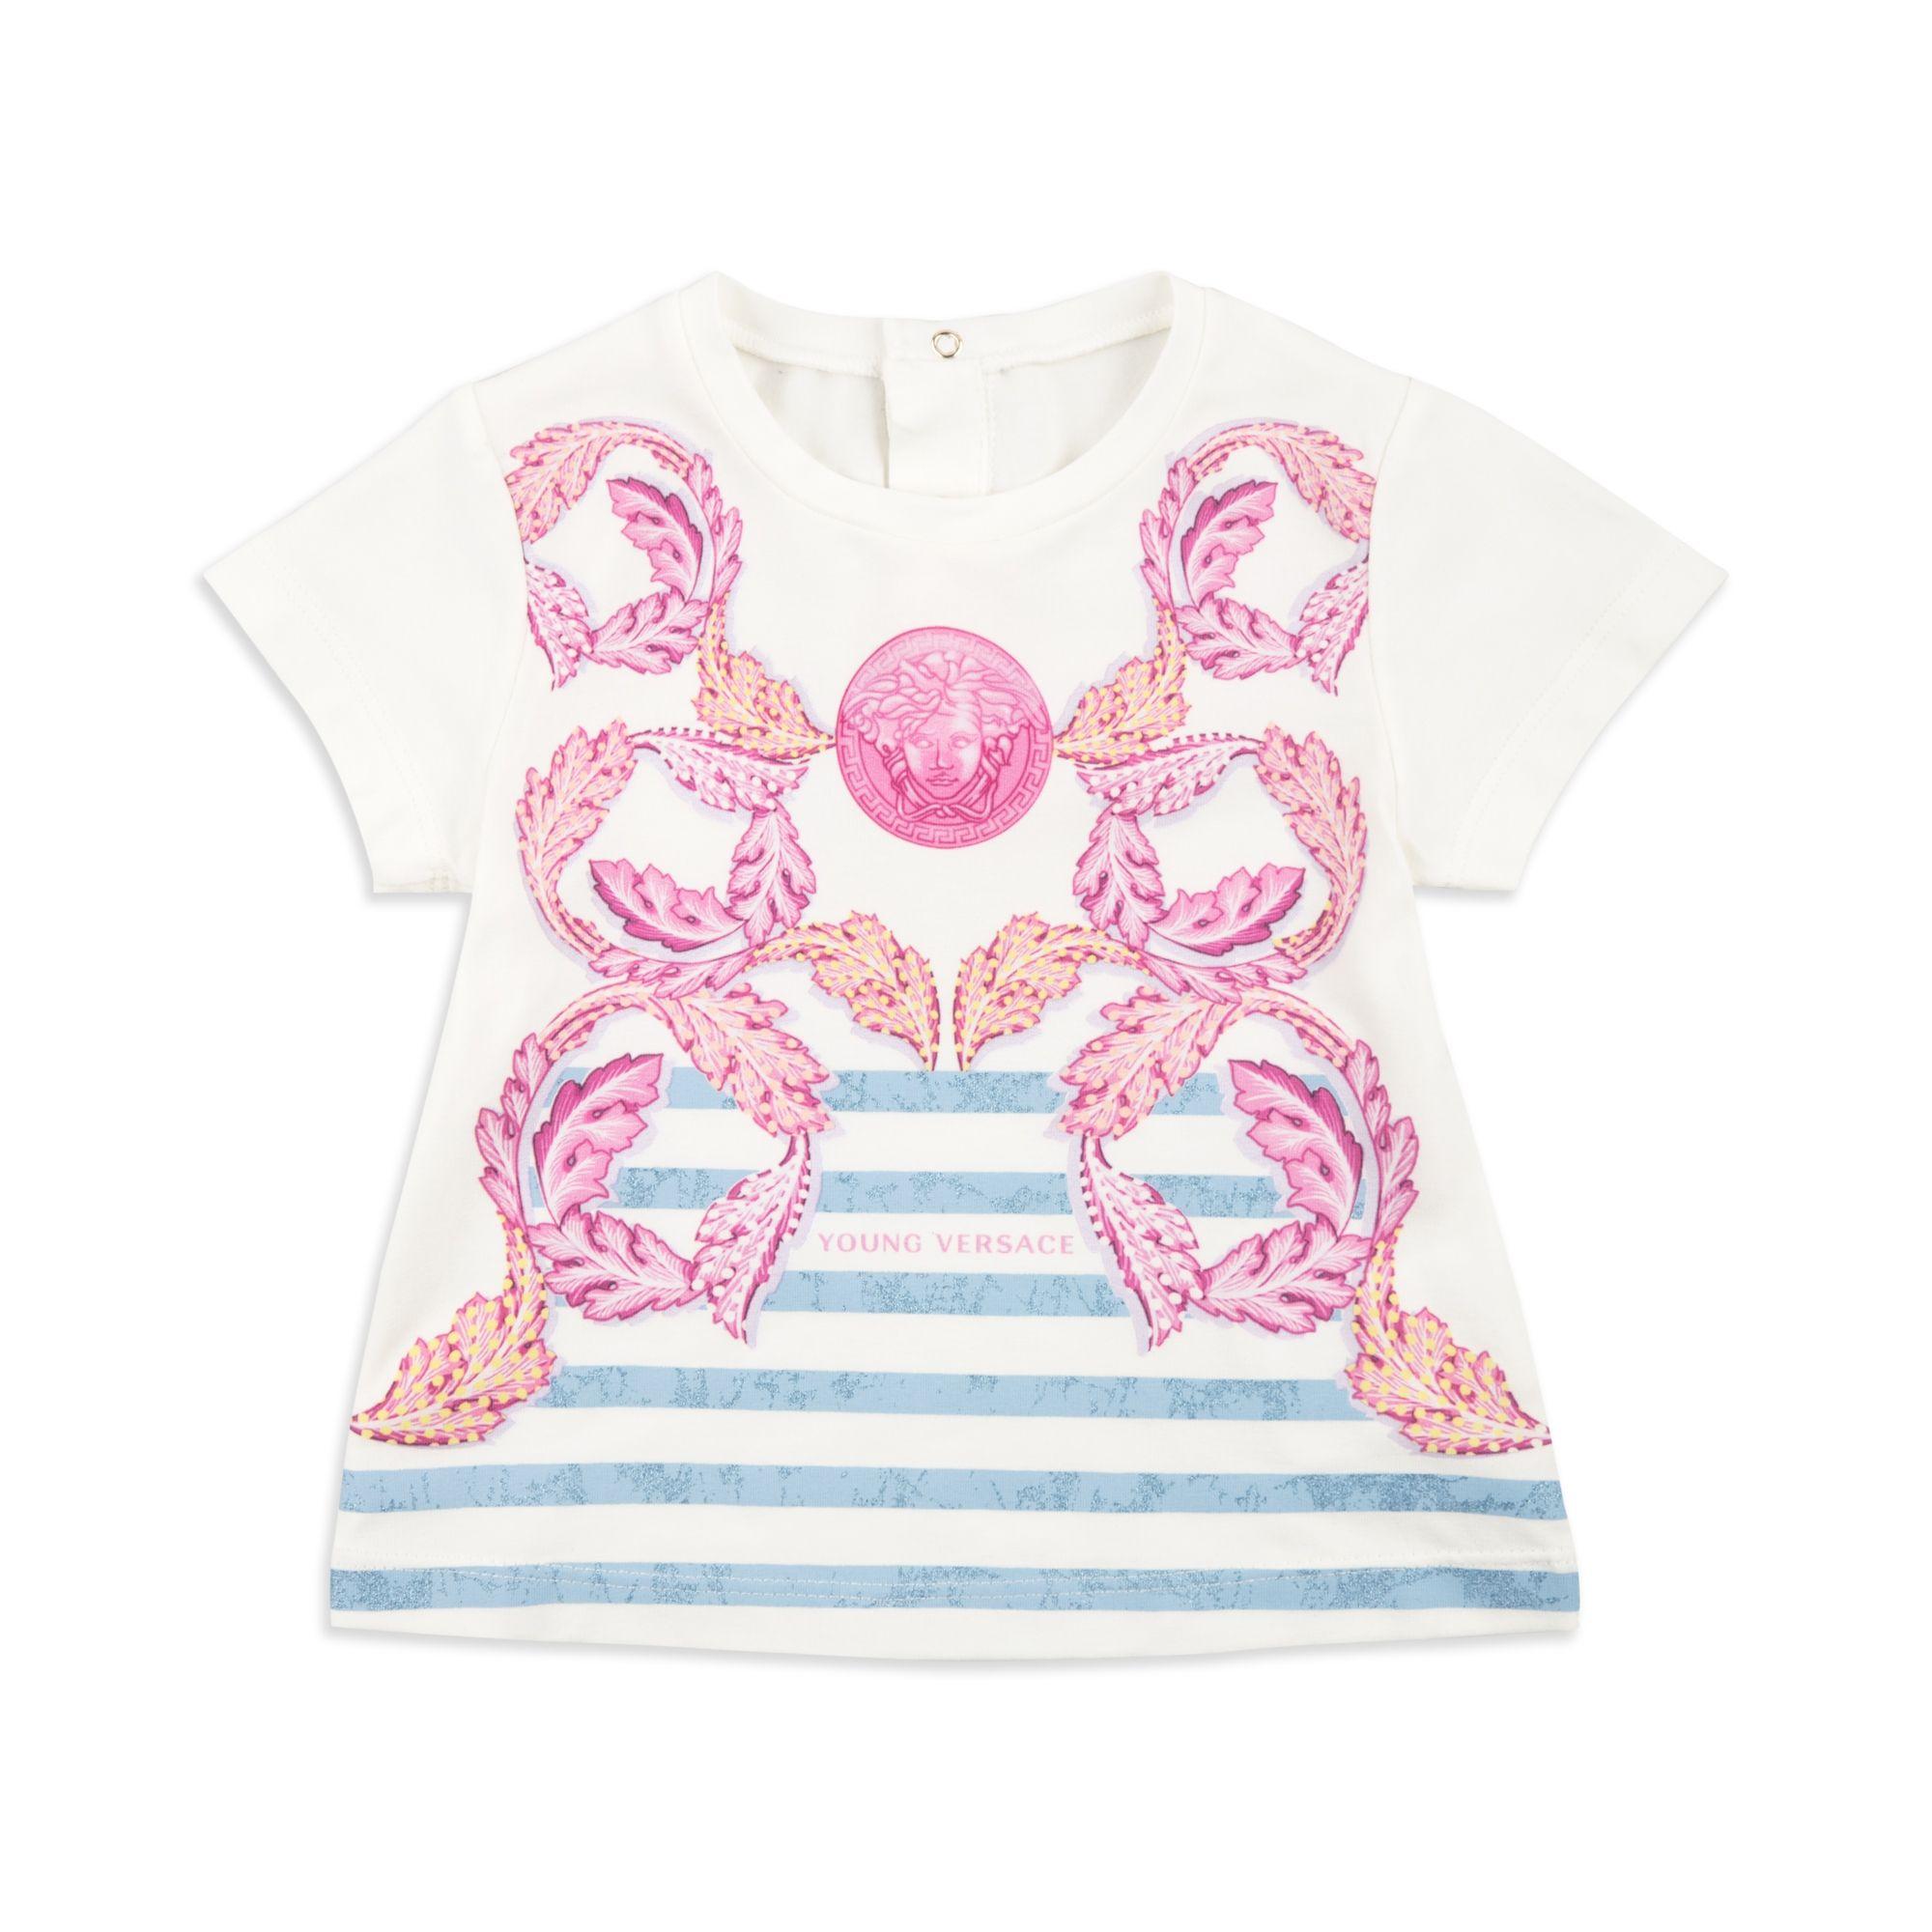 b06d79bf2b8 YOUNG VERSACE Baby Girls Baroque Print T-Shirt - White Baby short sleeve t-